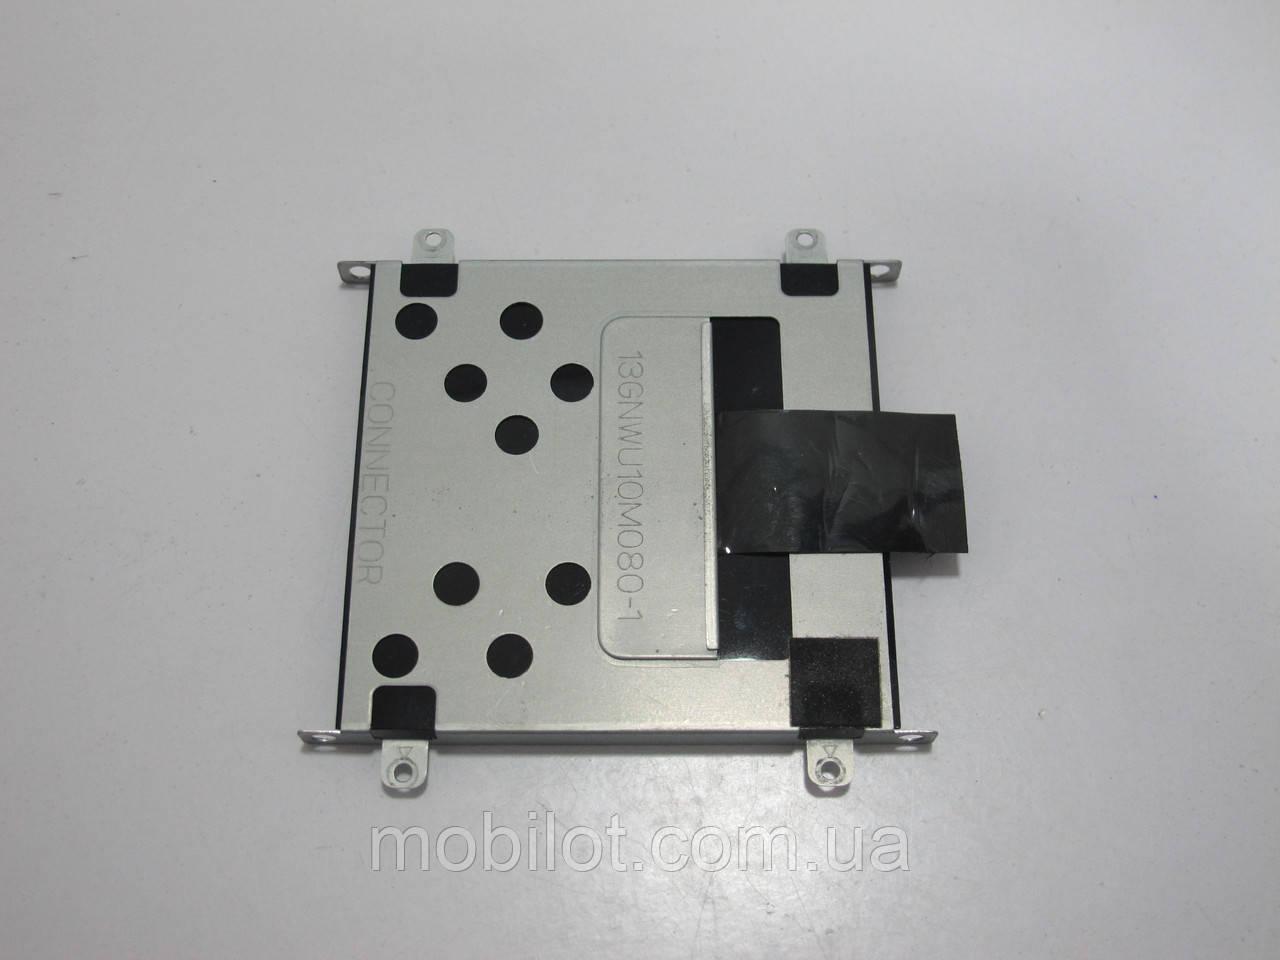 Корпус (карман, корзина, крепление) для HDD Asus UL50 (NZ-5644)